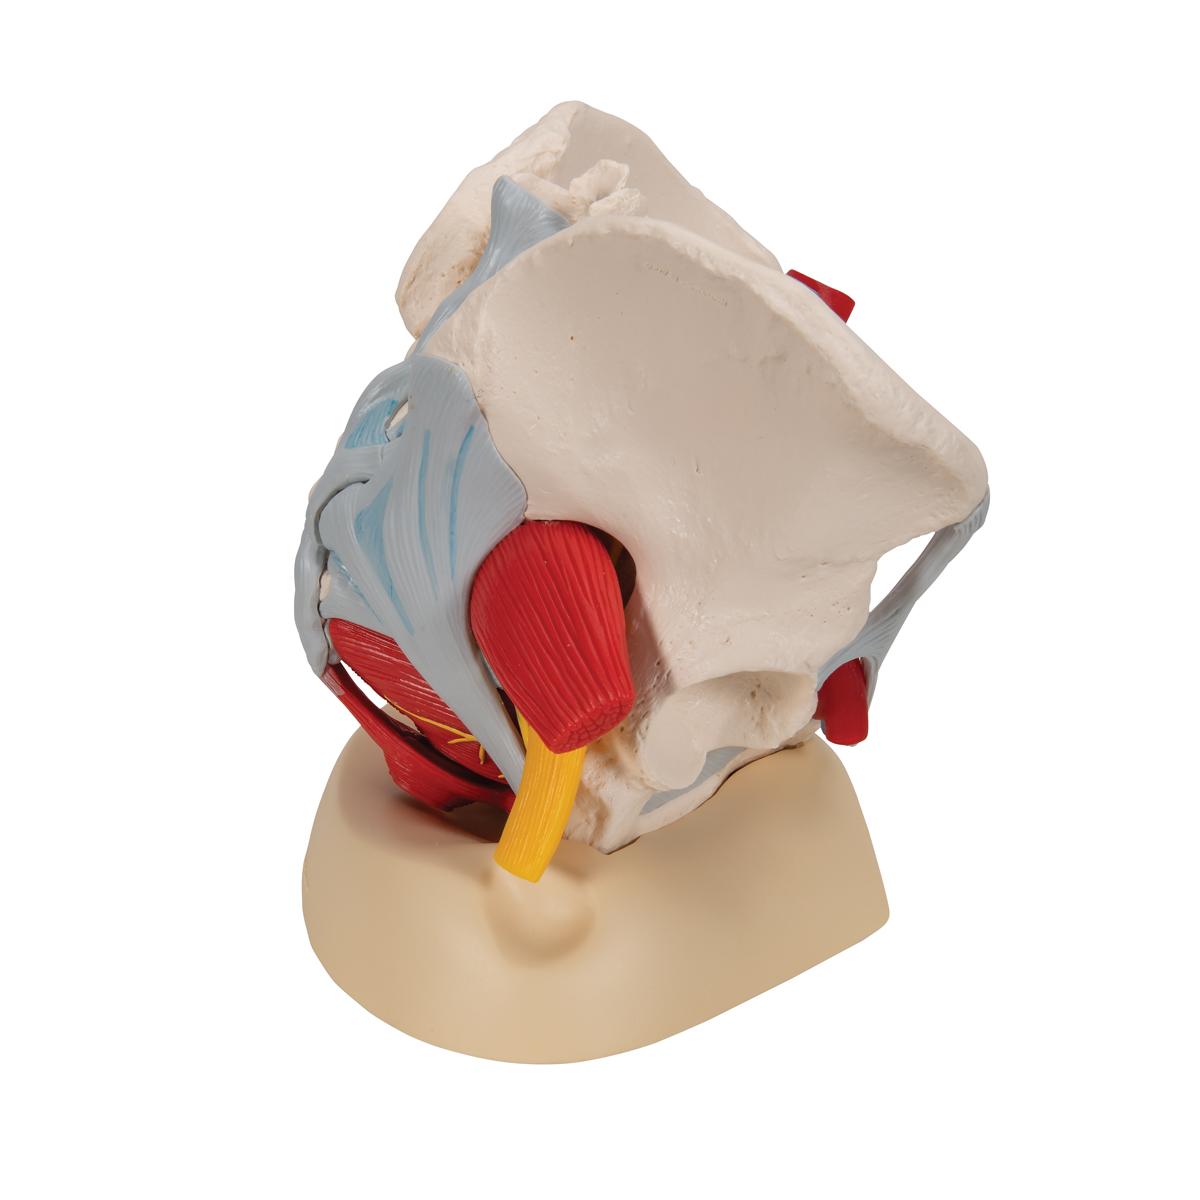 Anatomical Teaching Models | Plastic Human Pelvic Models ...